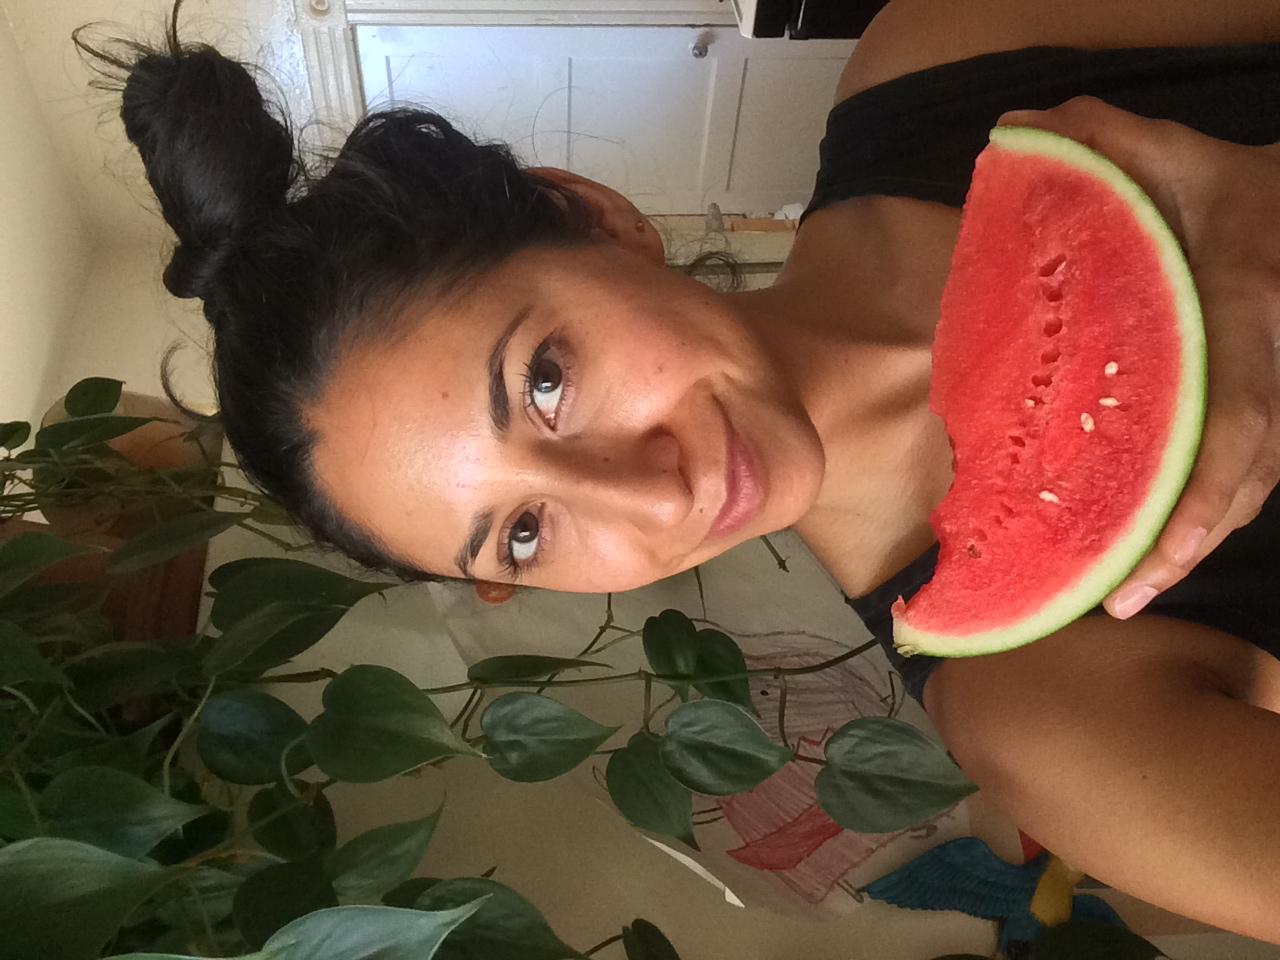 mewatermelon.JPG